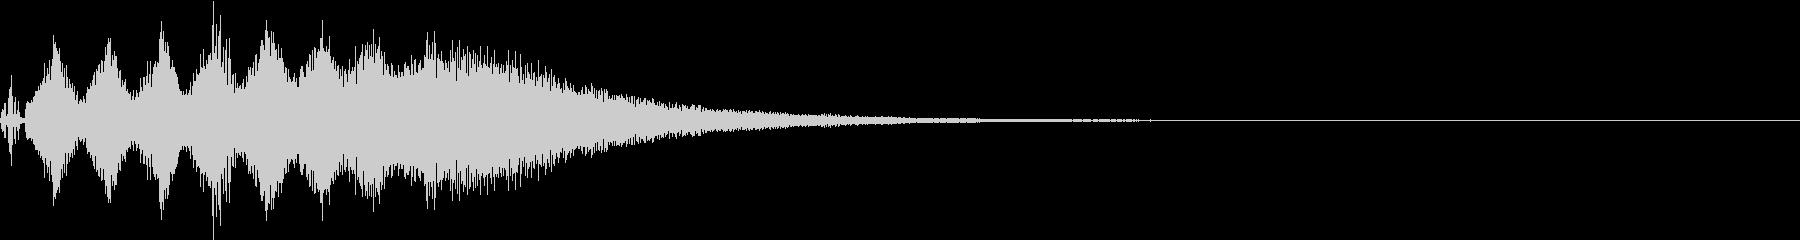 TVFX 目立たせ・アイキャッチ 12の未再生の波形